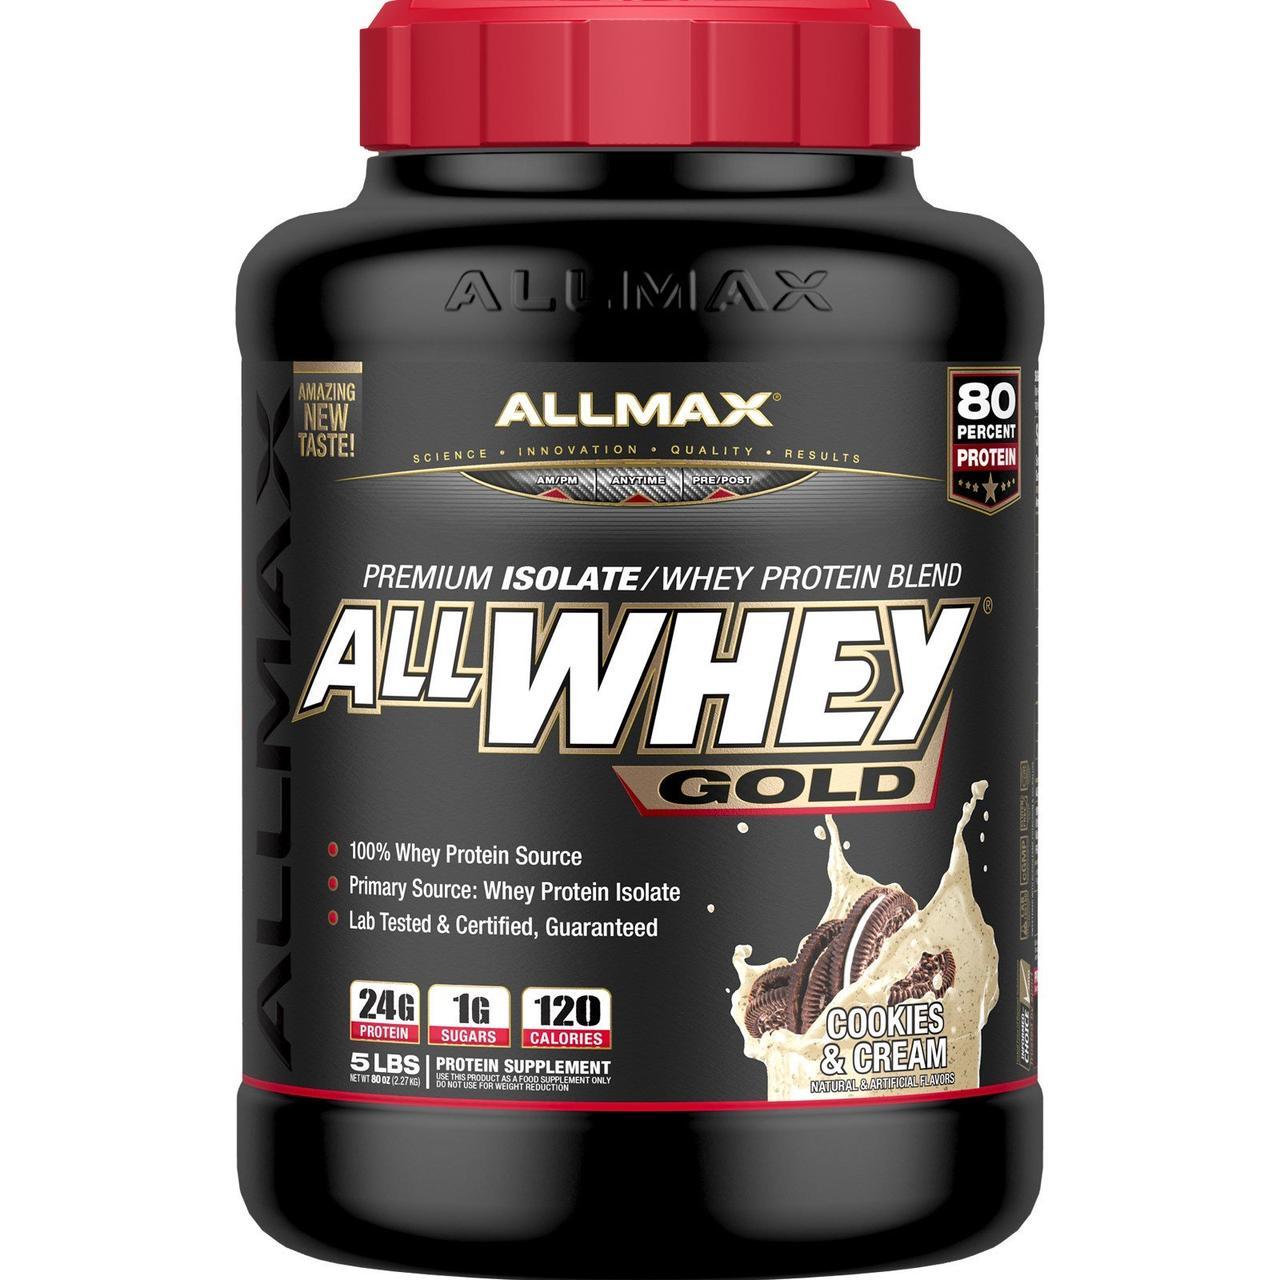 Премиум Изолят/Смесь Сывороточного Протеина, Печенье и Сливки, Premium Isolate, ALLMAX Nutrition, 2.27 кг.